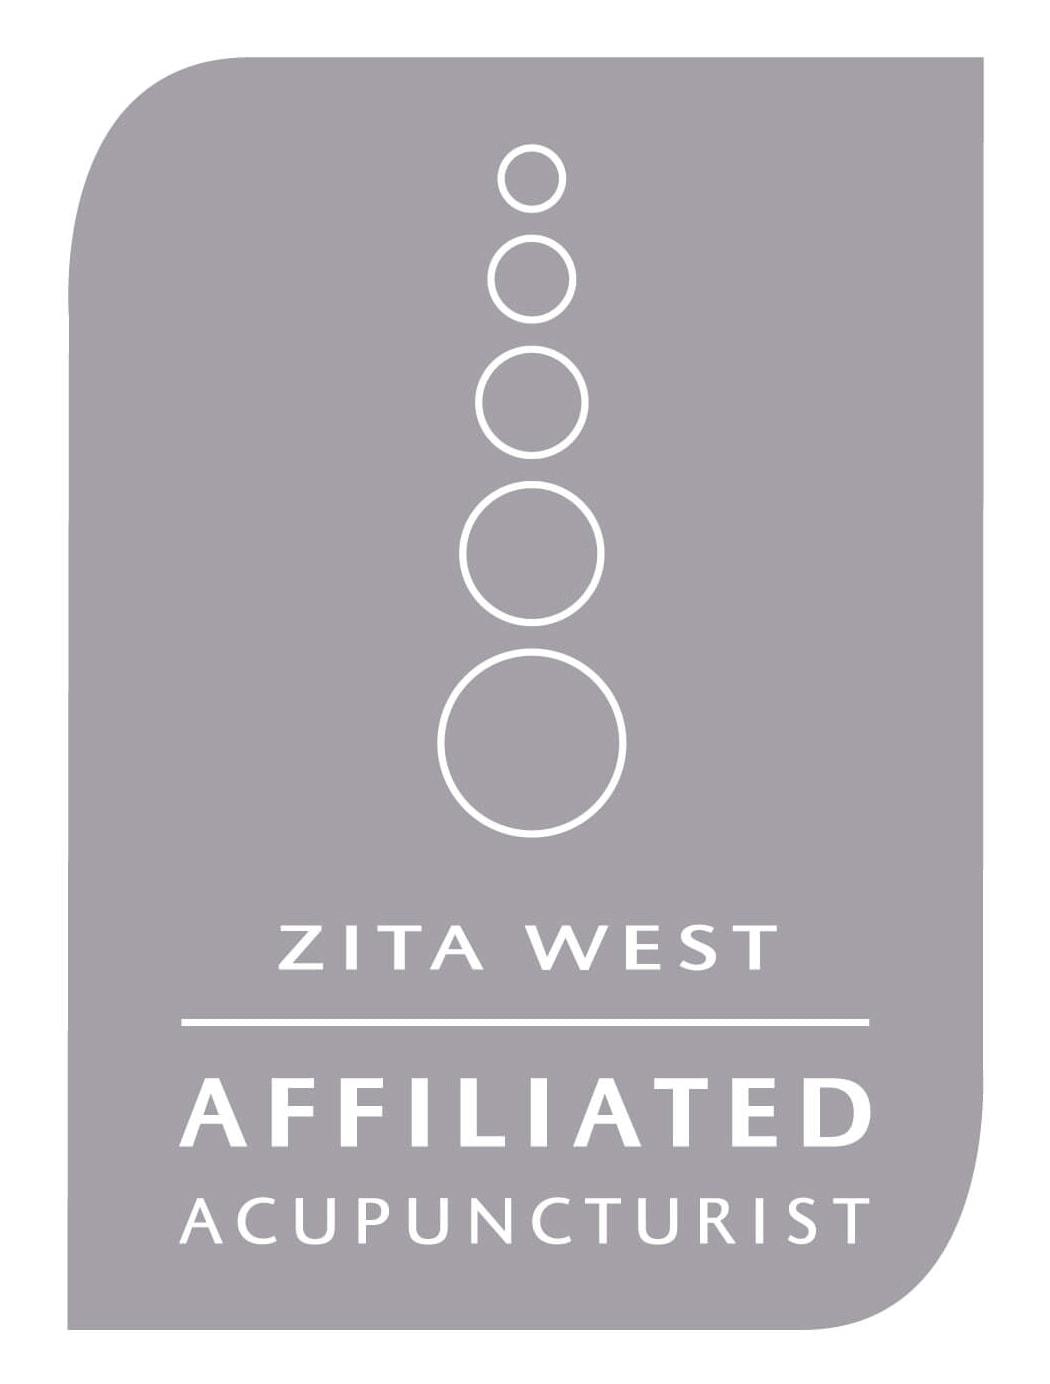 fertility acupuncture abingdon sutton courtenay oxford - affiliated zita